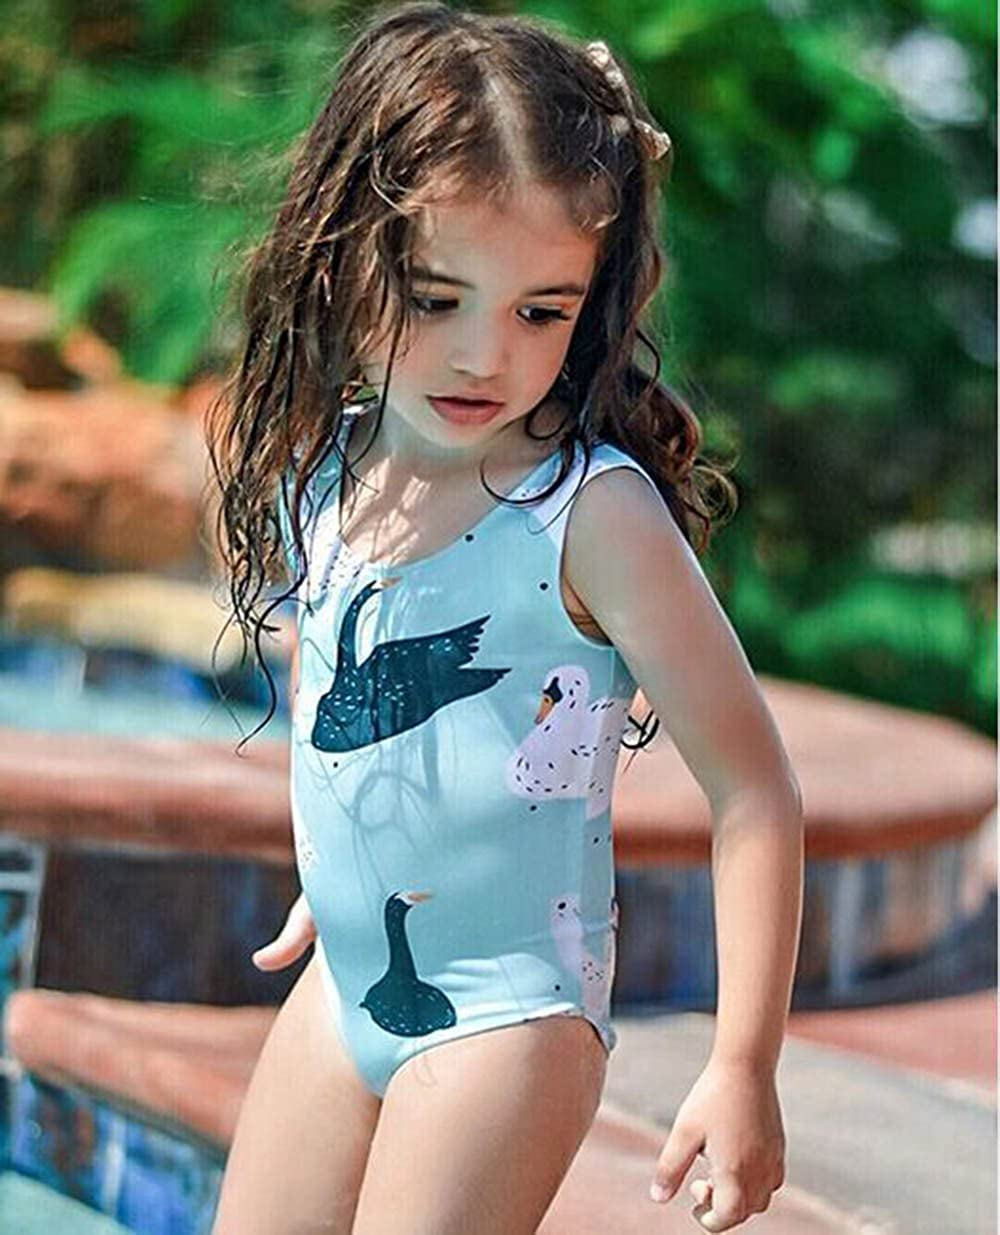 Fartido Kid Girl Eye Print Striped Swimsuits Jumpsuit Swimwear Beach Clothes